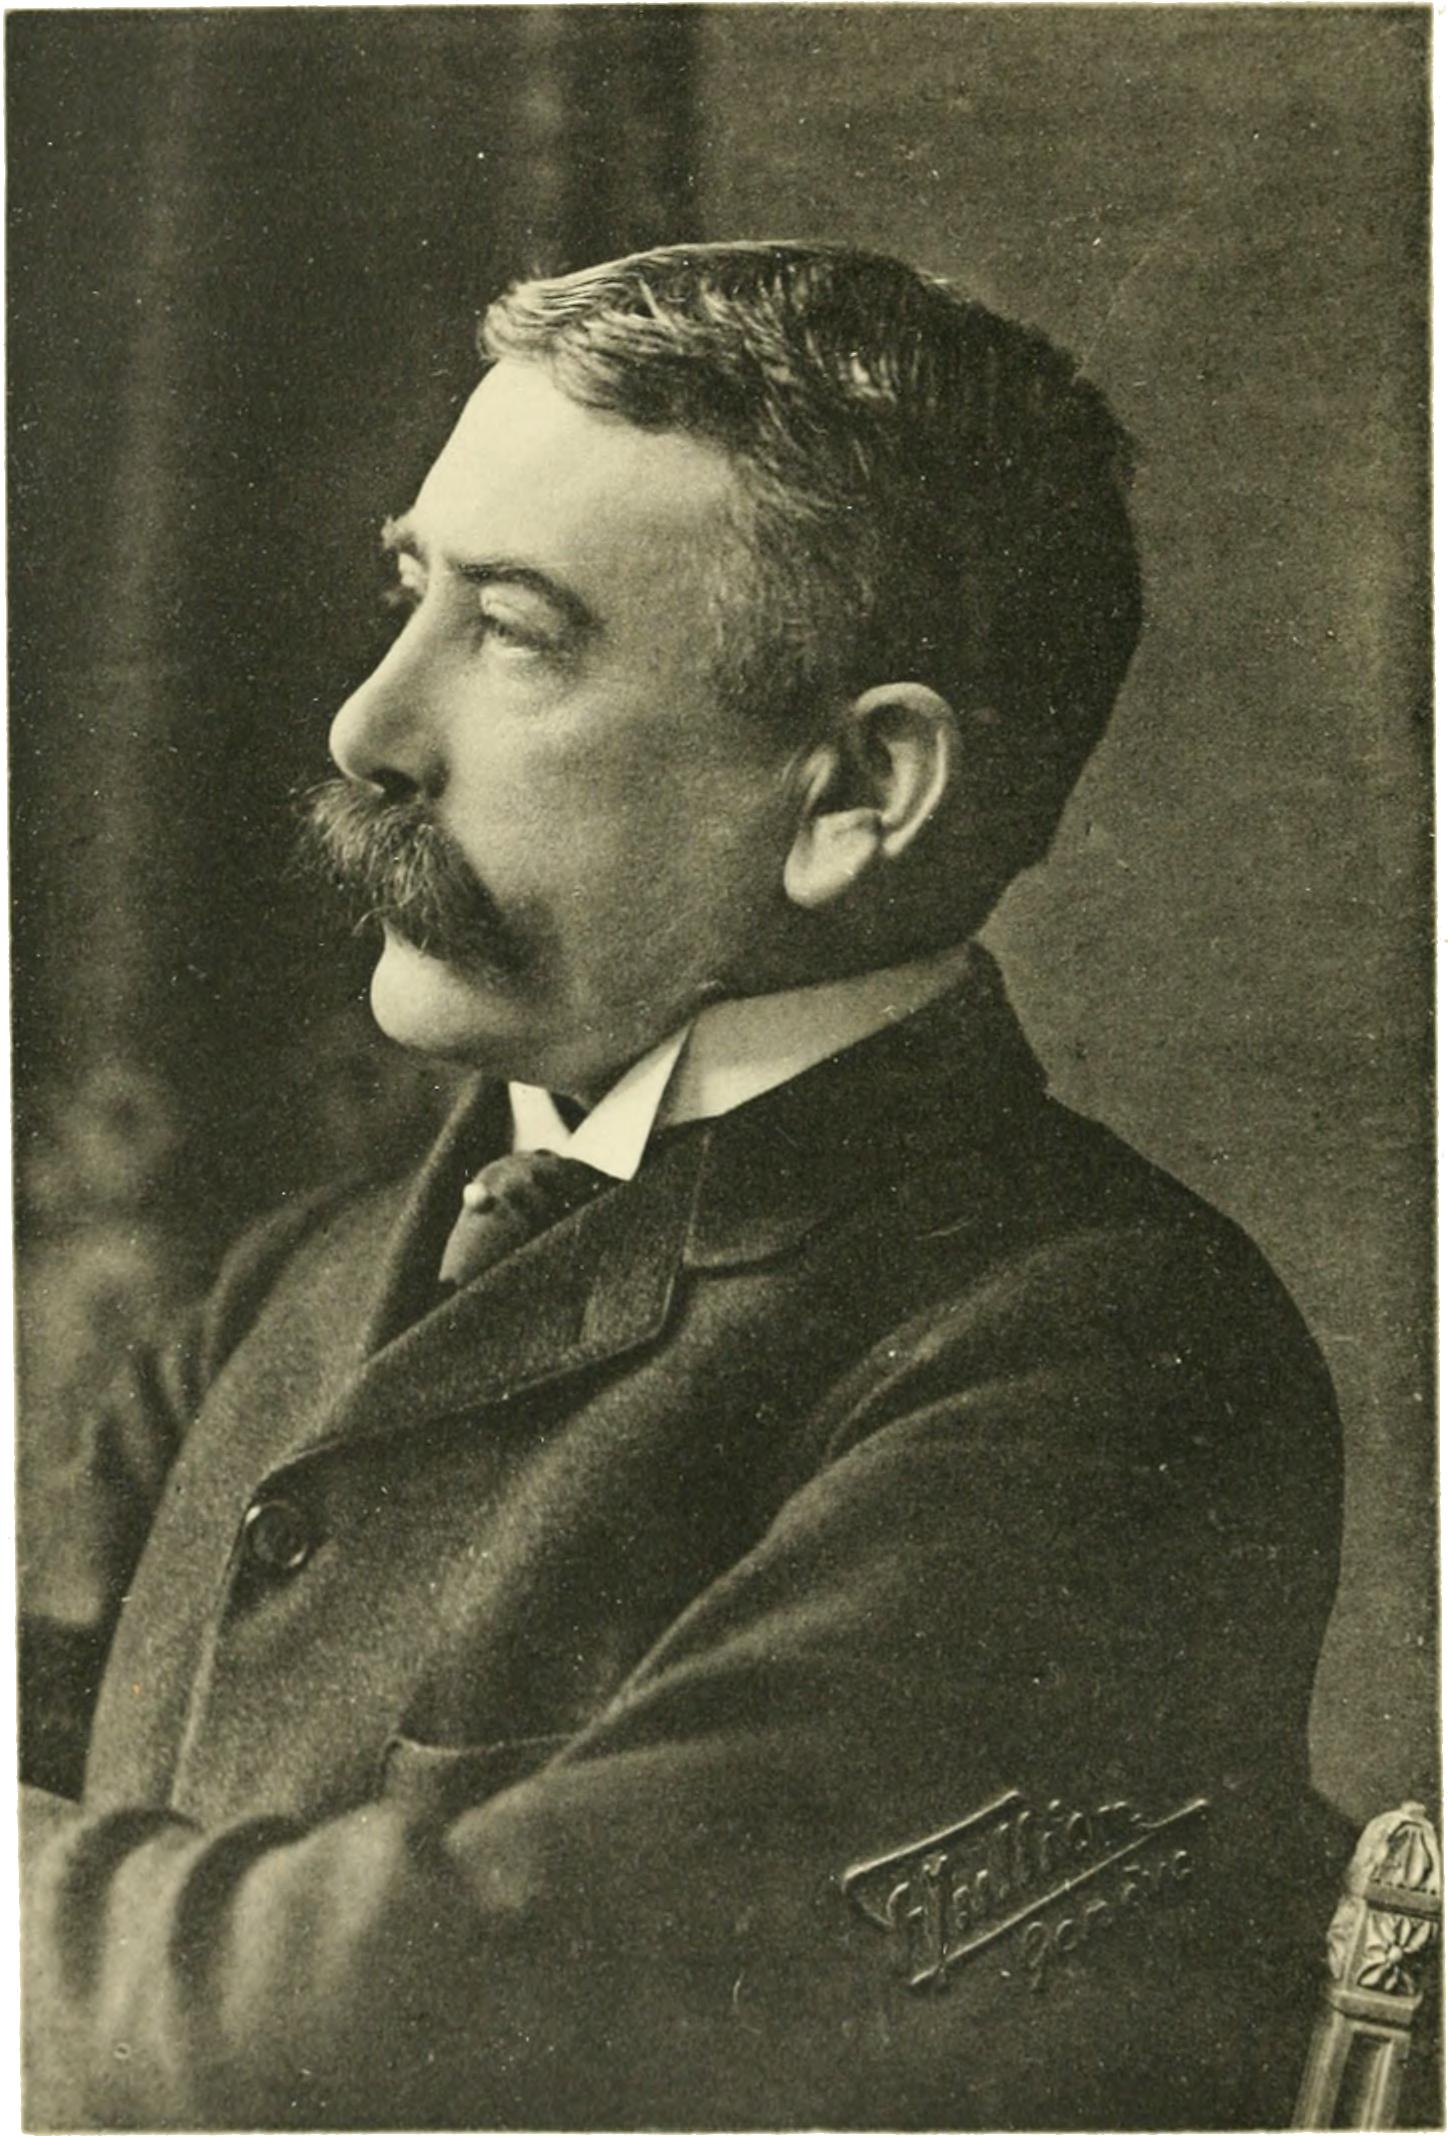 Ferdinand de Saussure Photography by F. Jullien Genève